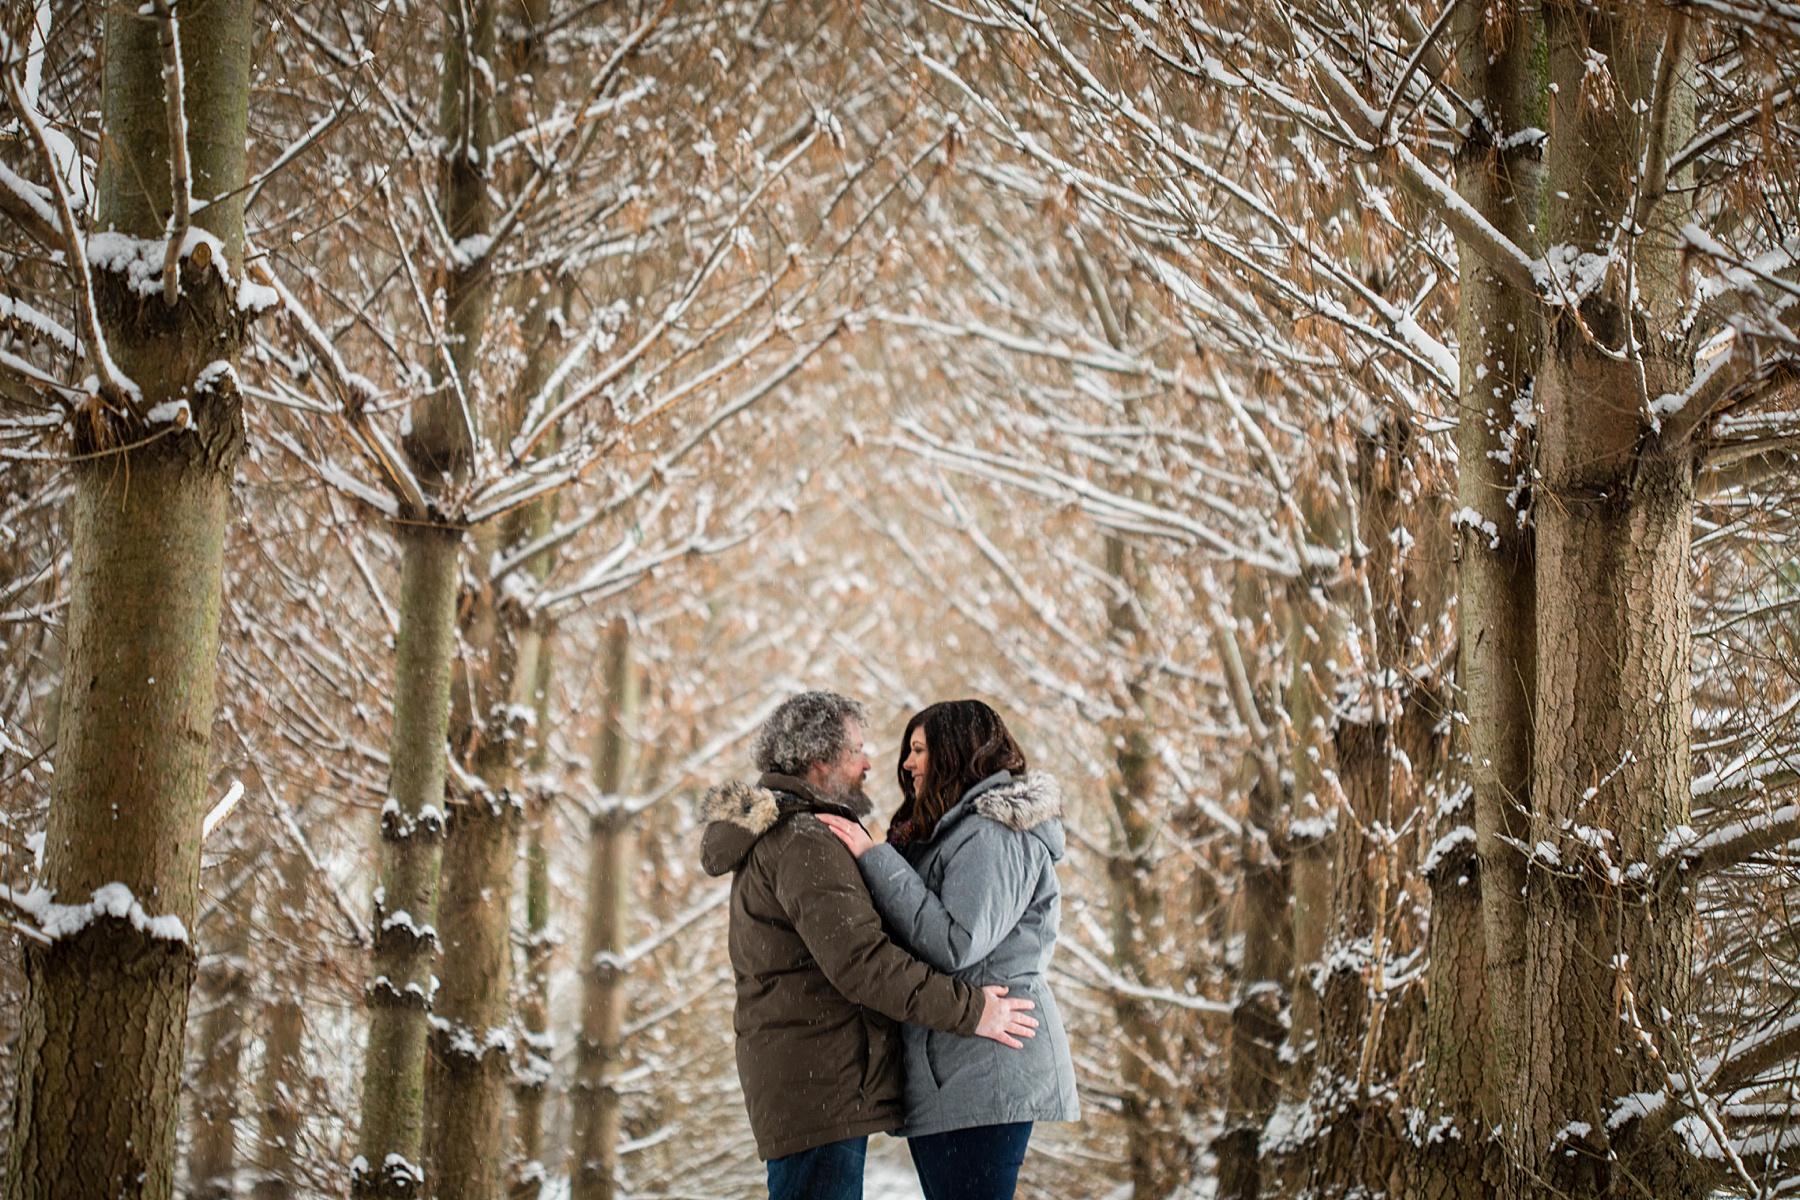 Brandon_Shafer_Photography_Winter_Engagement010.JPG